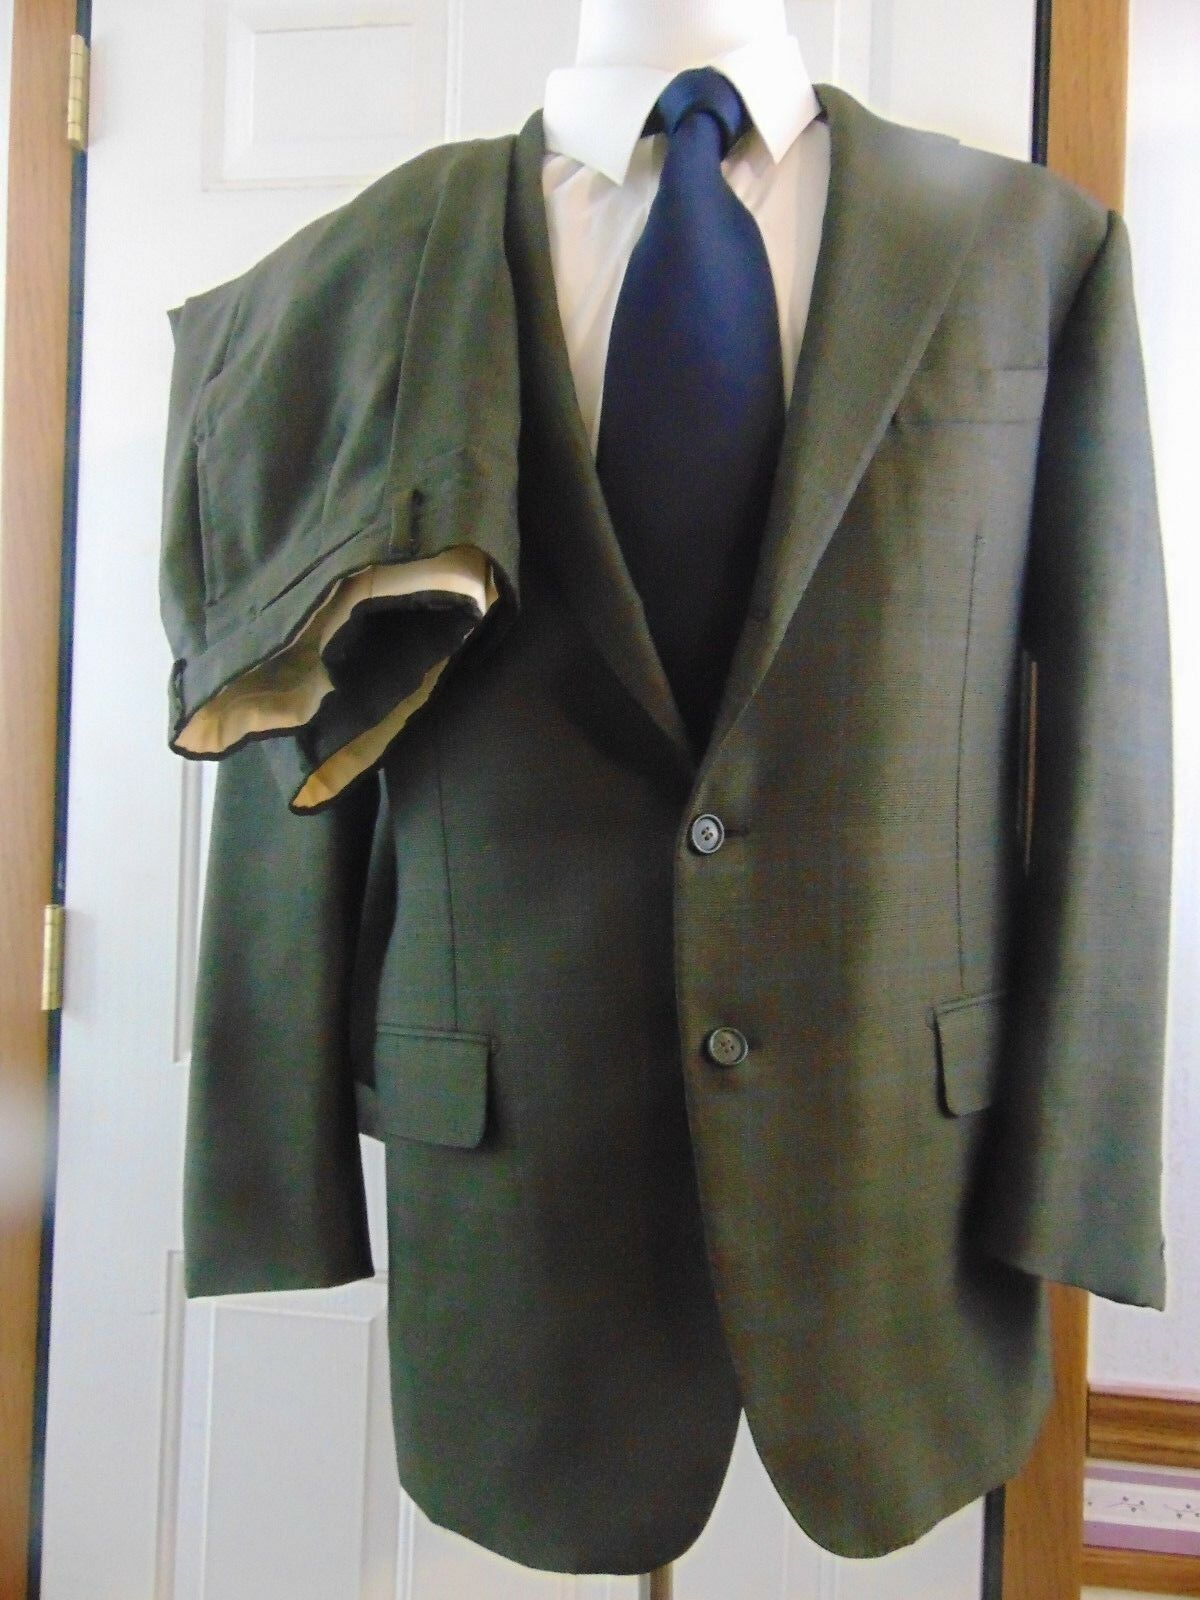 Faconnable Tailleur  2-PC Suit grau Taupe Houndstooth Glenplaid EU 56 US 44